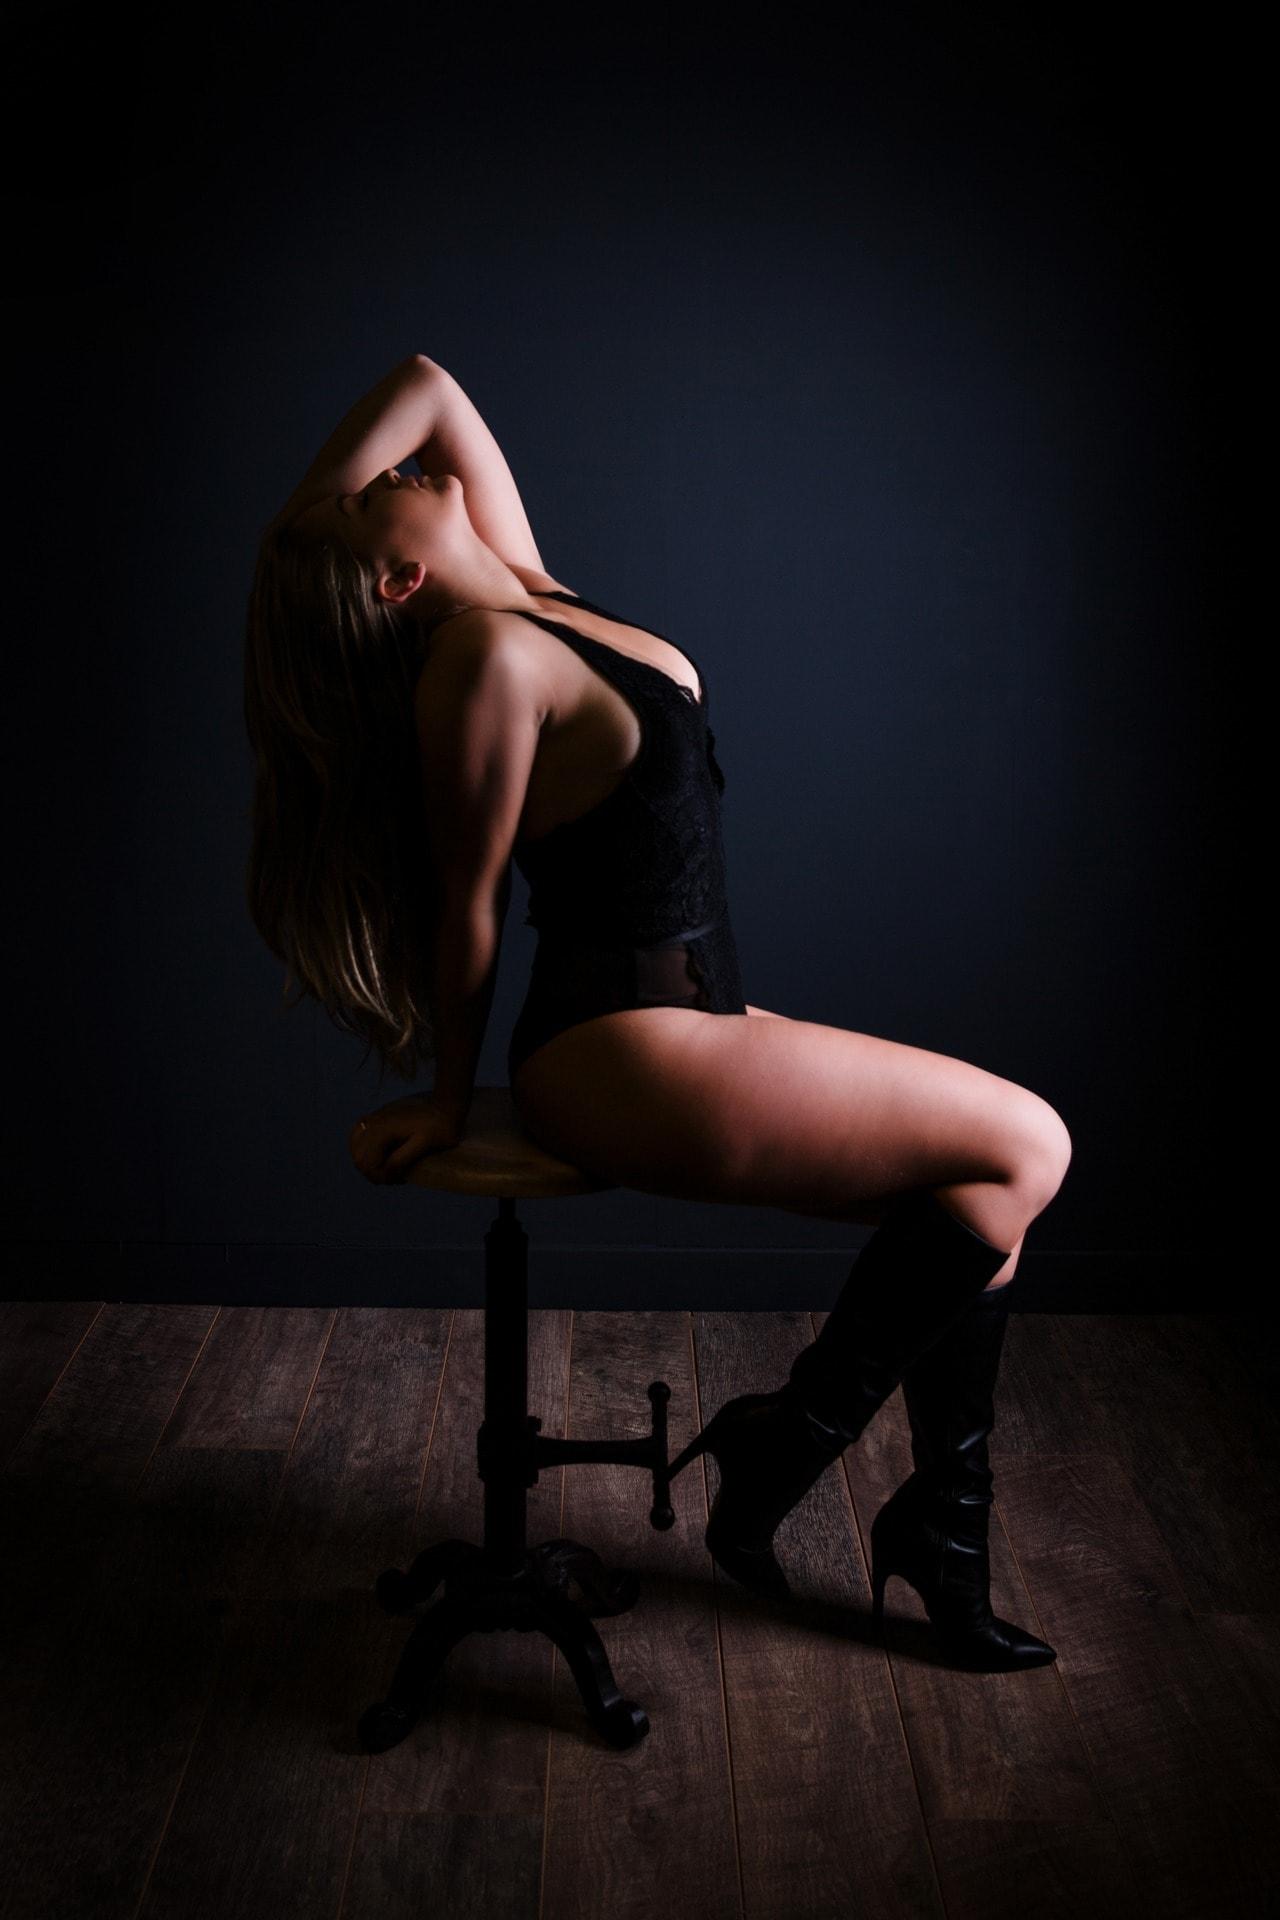 leeds-boudoir-photograph